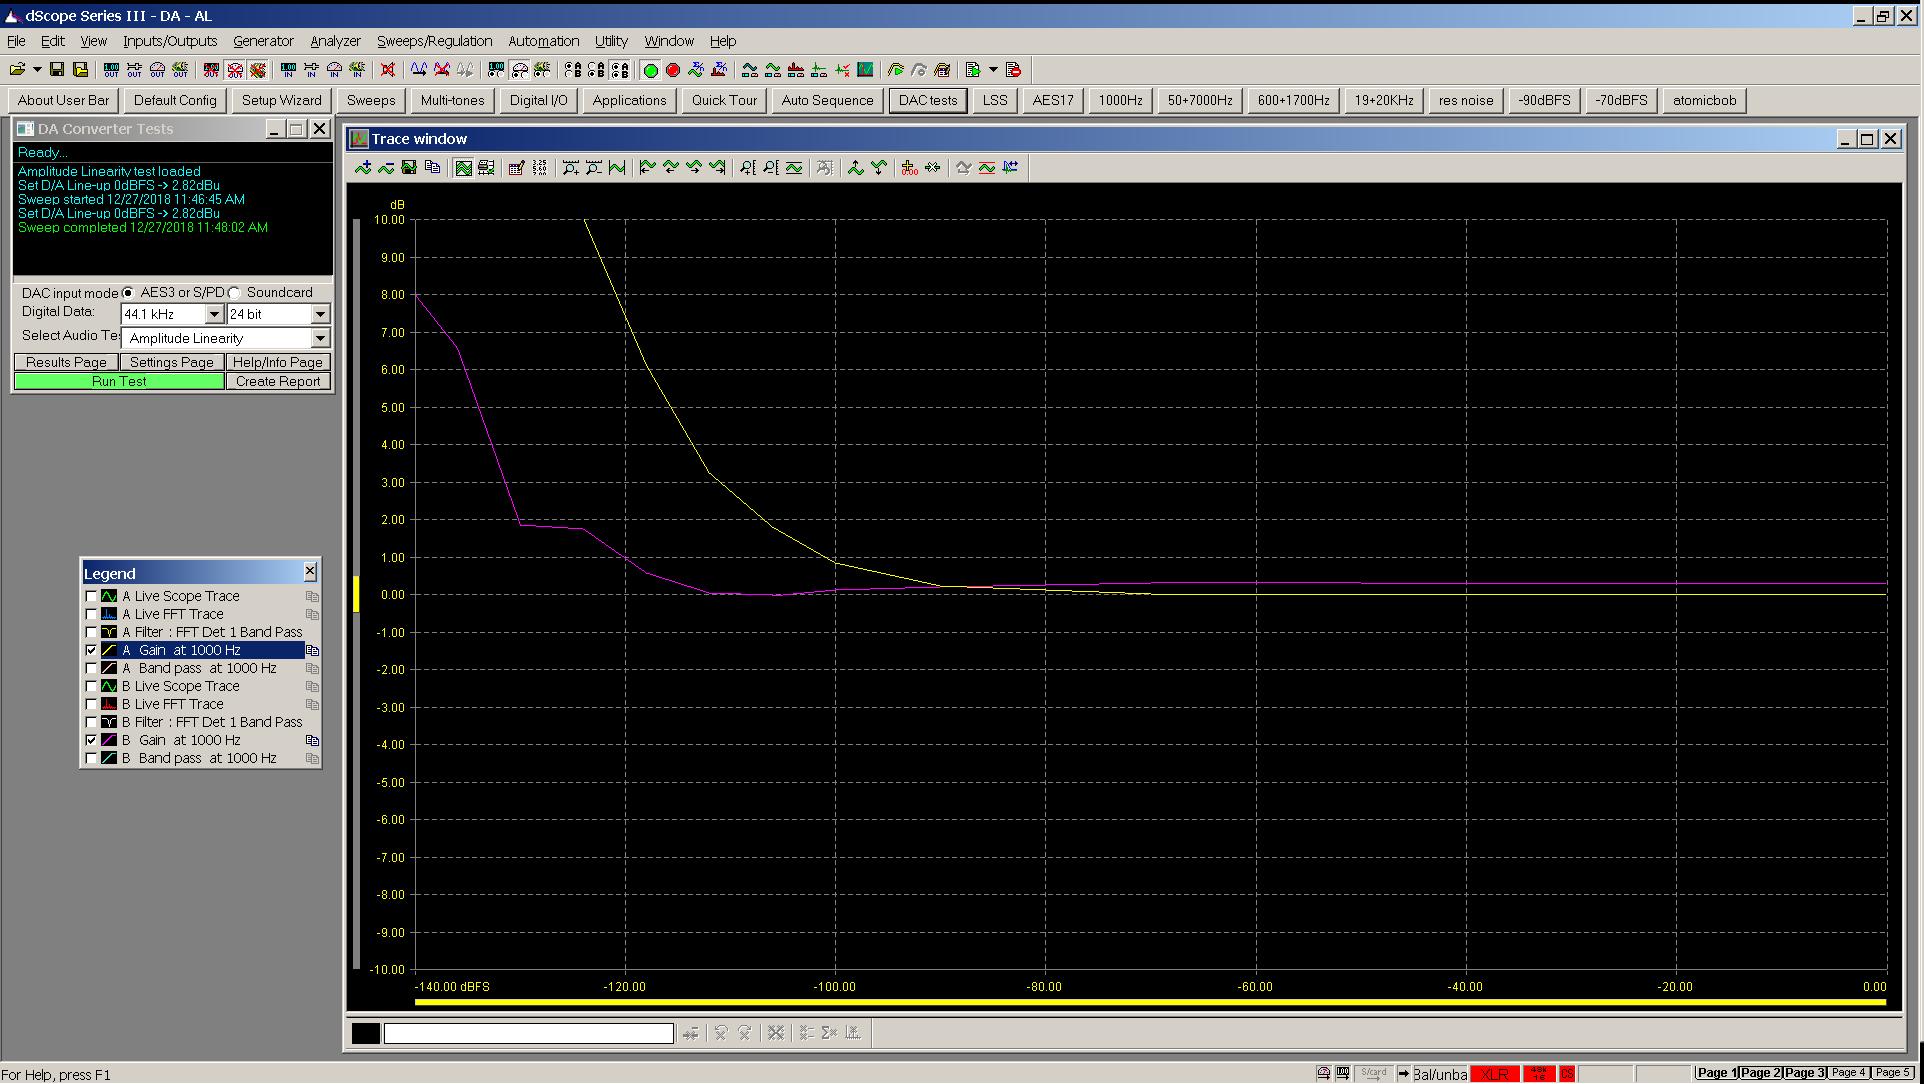 20181227-11 convert2 Bal 1 KHz gain linearity - AES.PNG